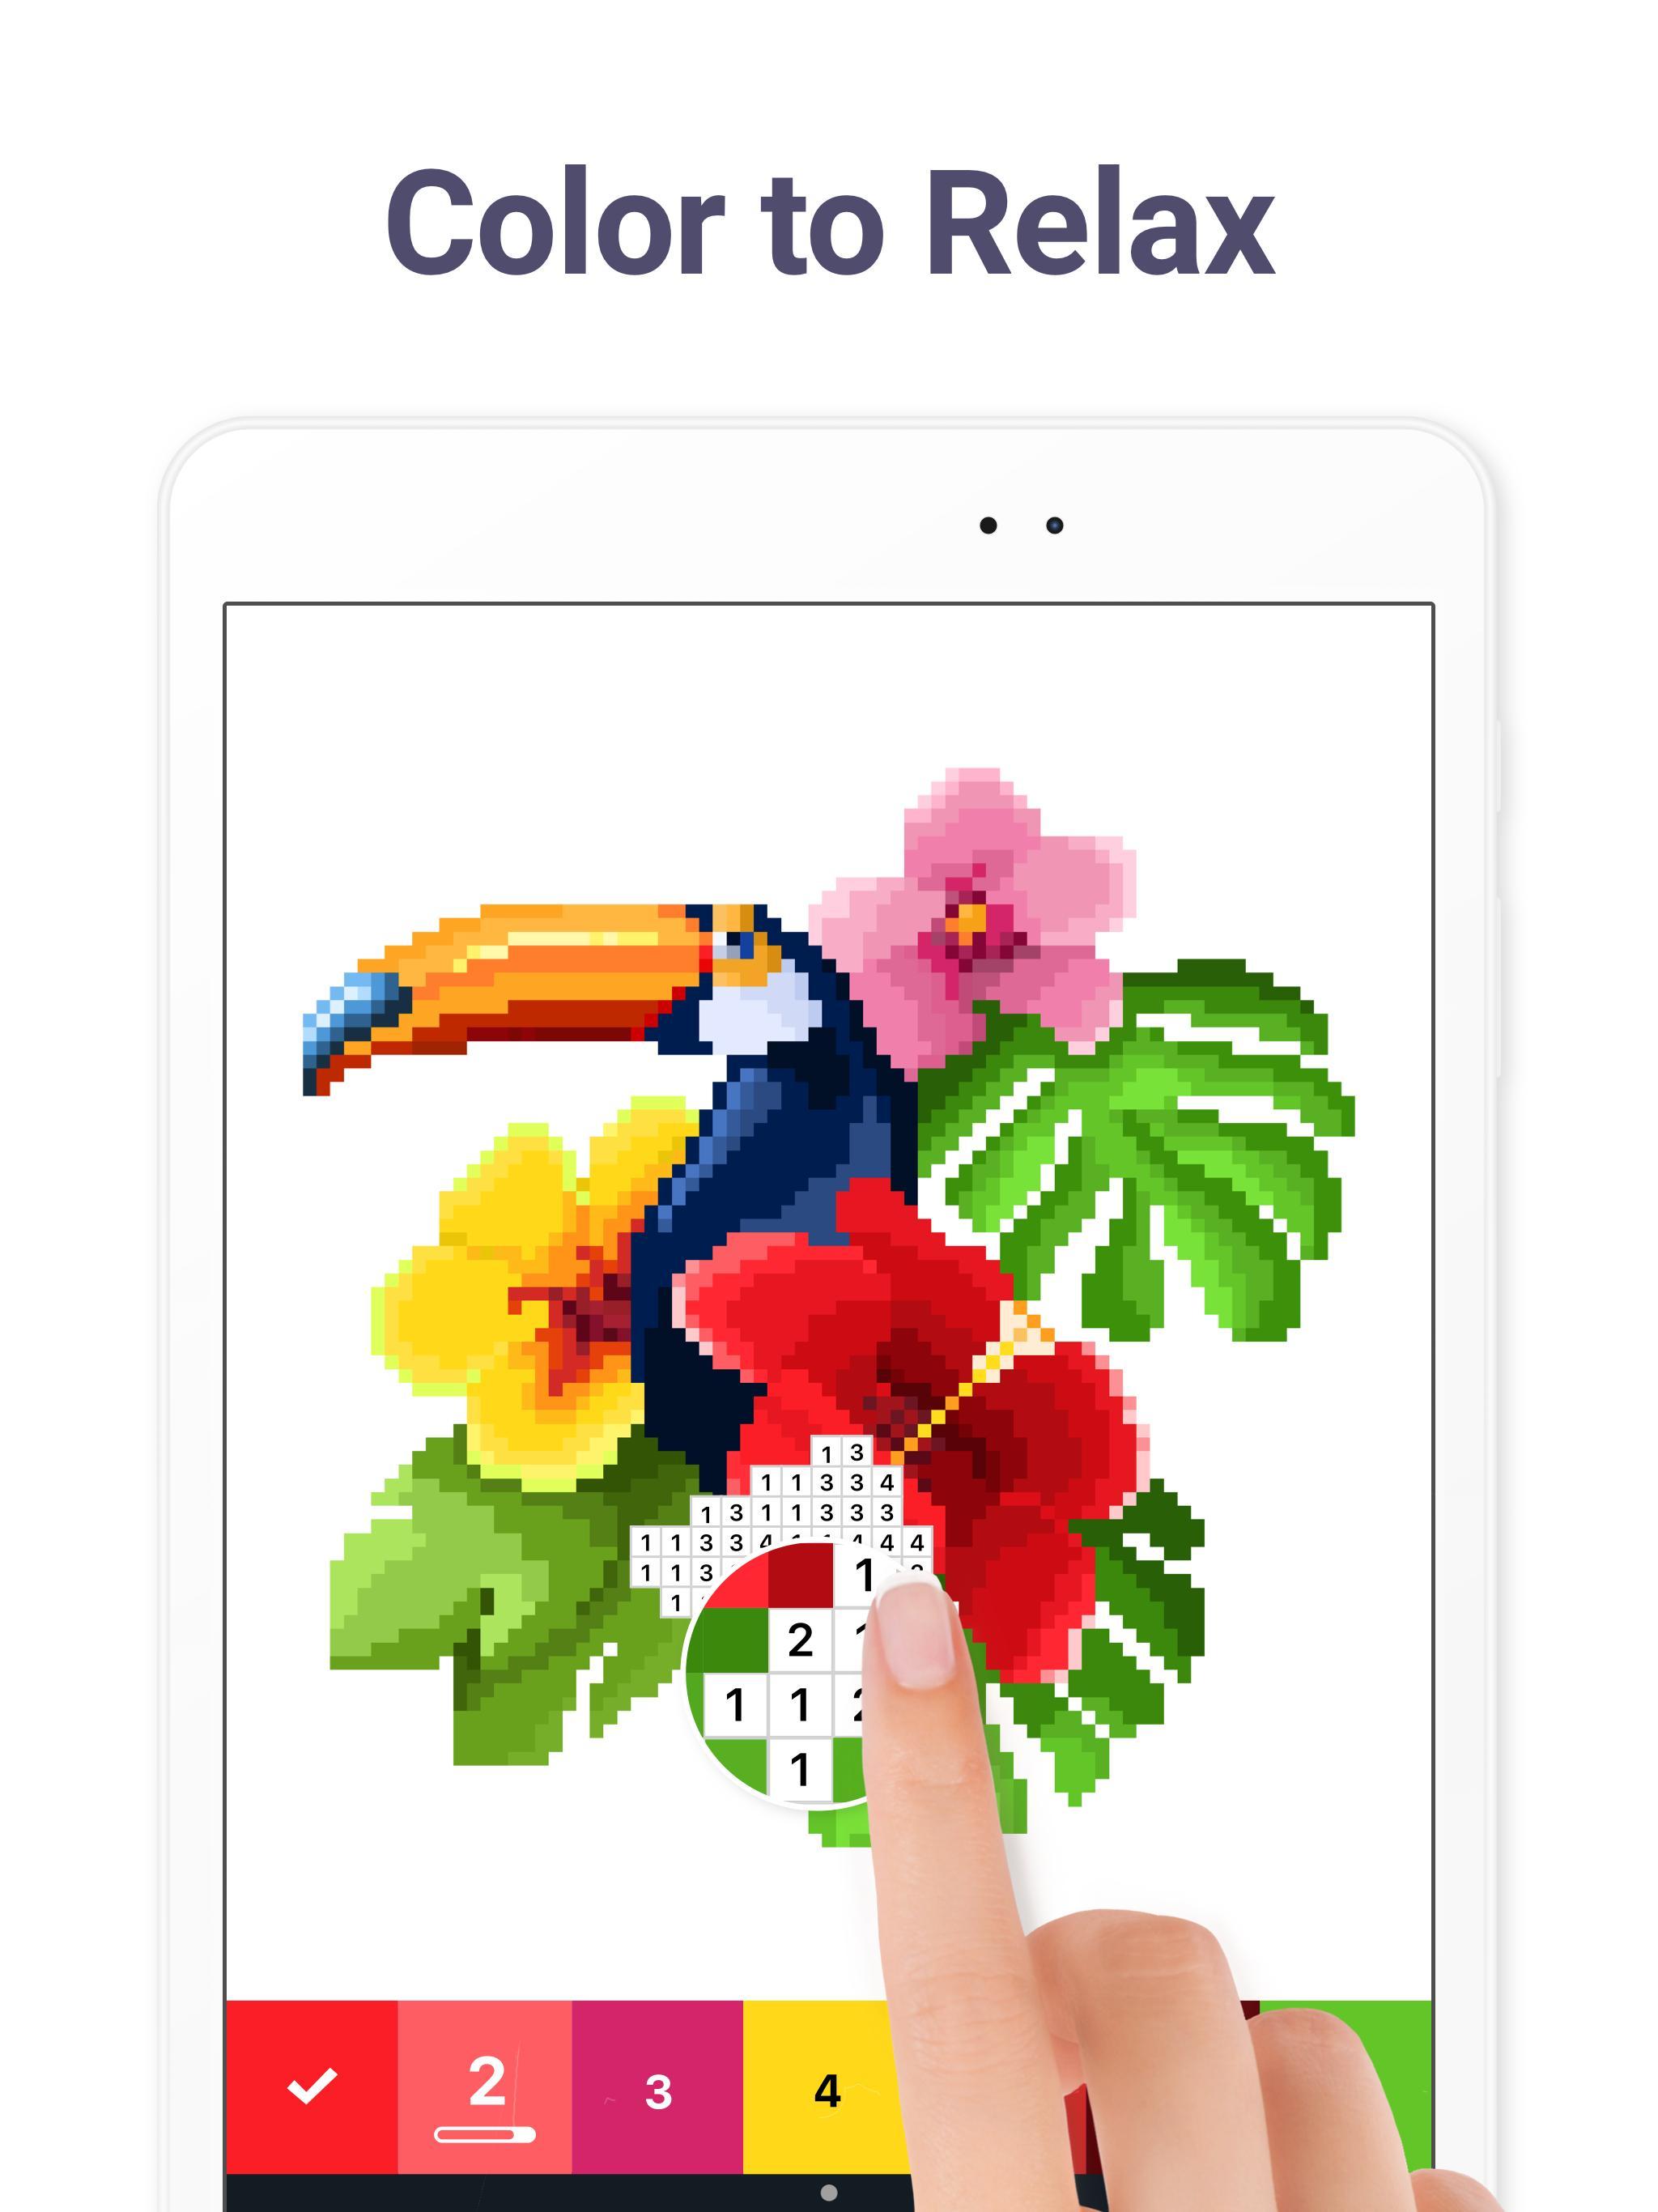 Pixel Art Color by Number 5.1.3 Screenshot 17